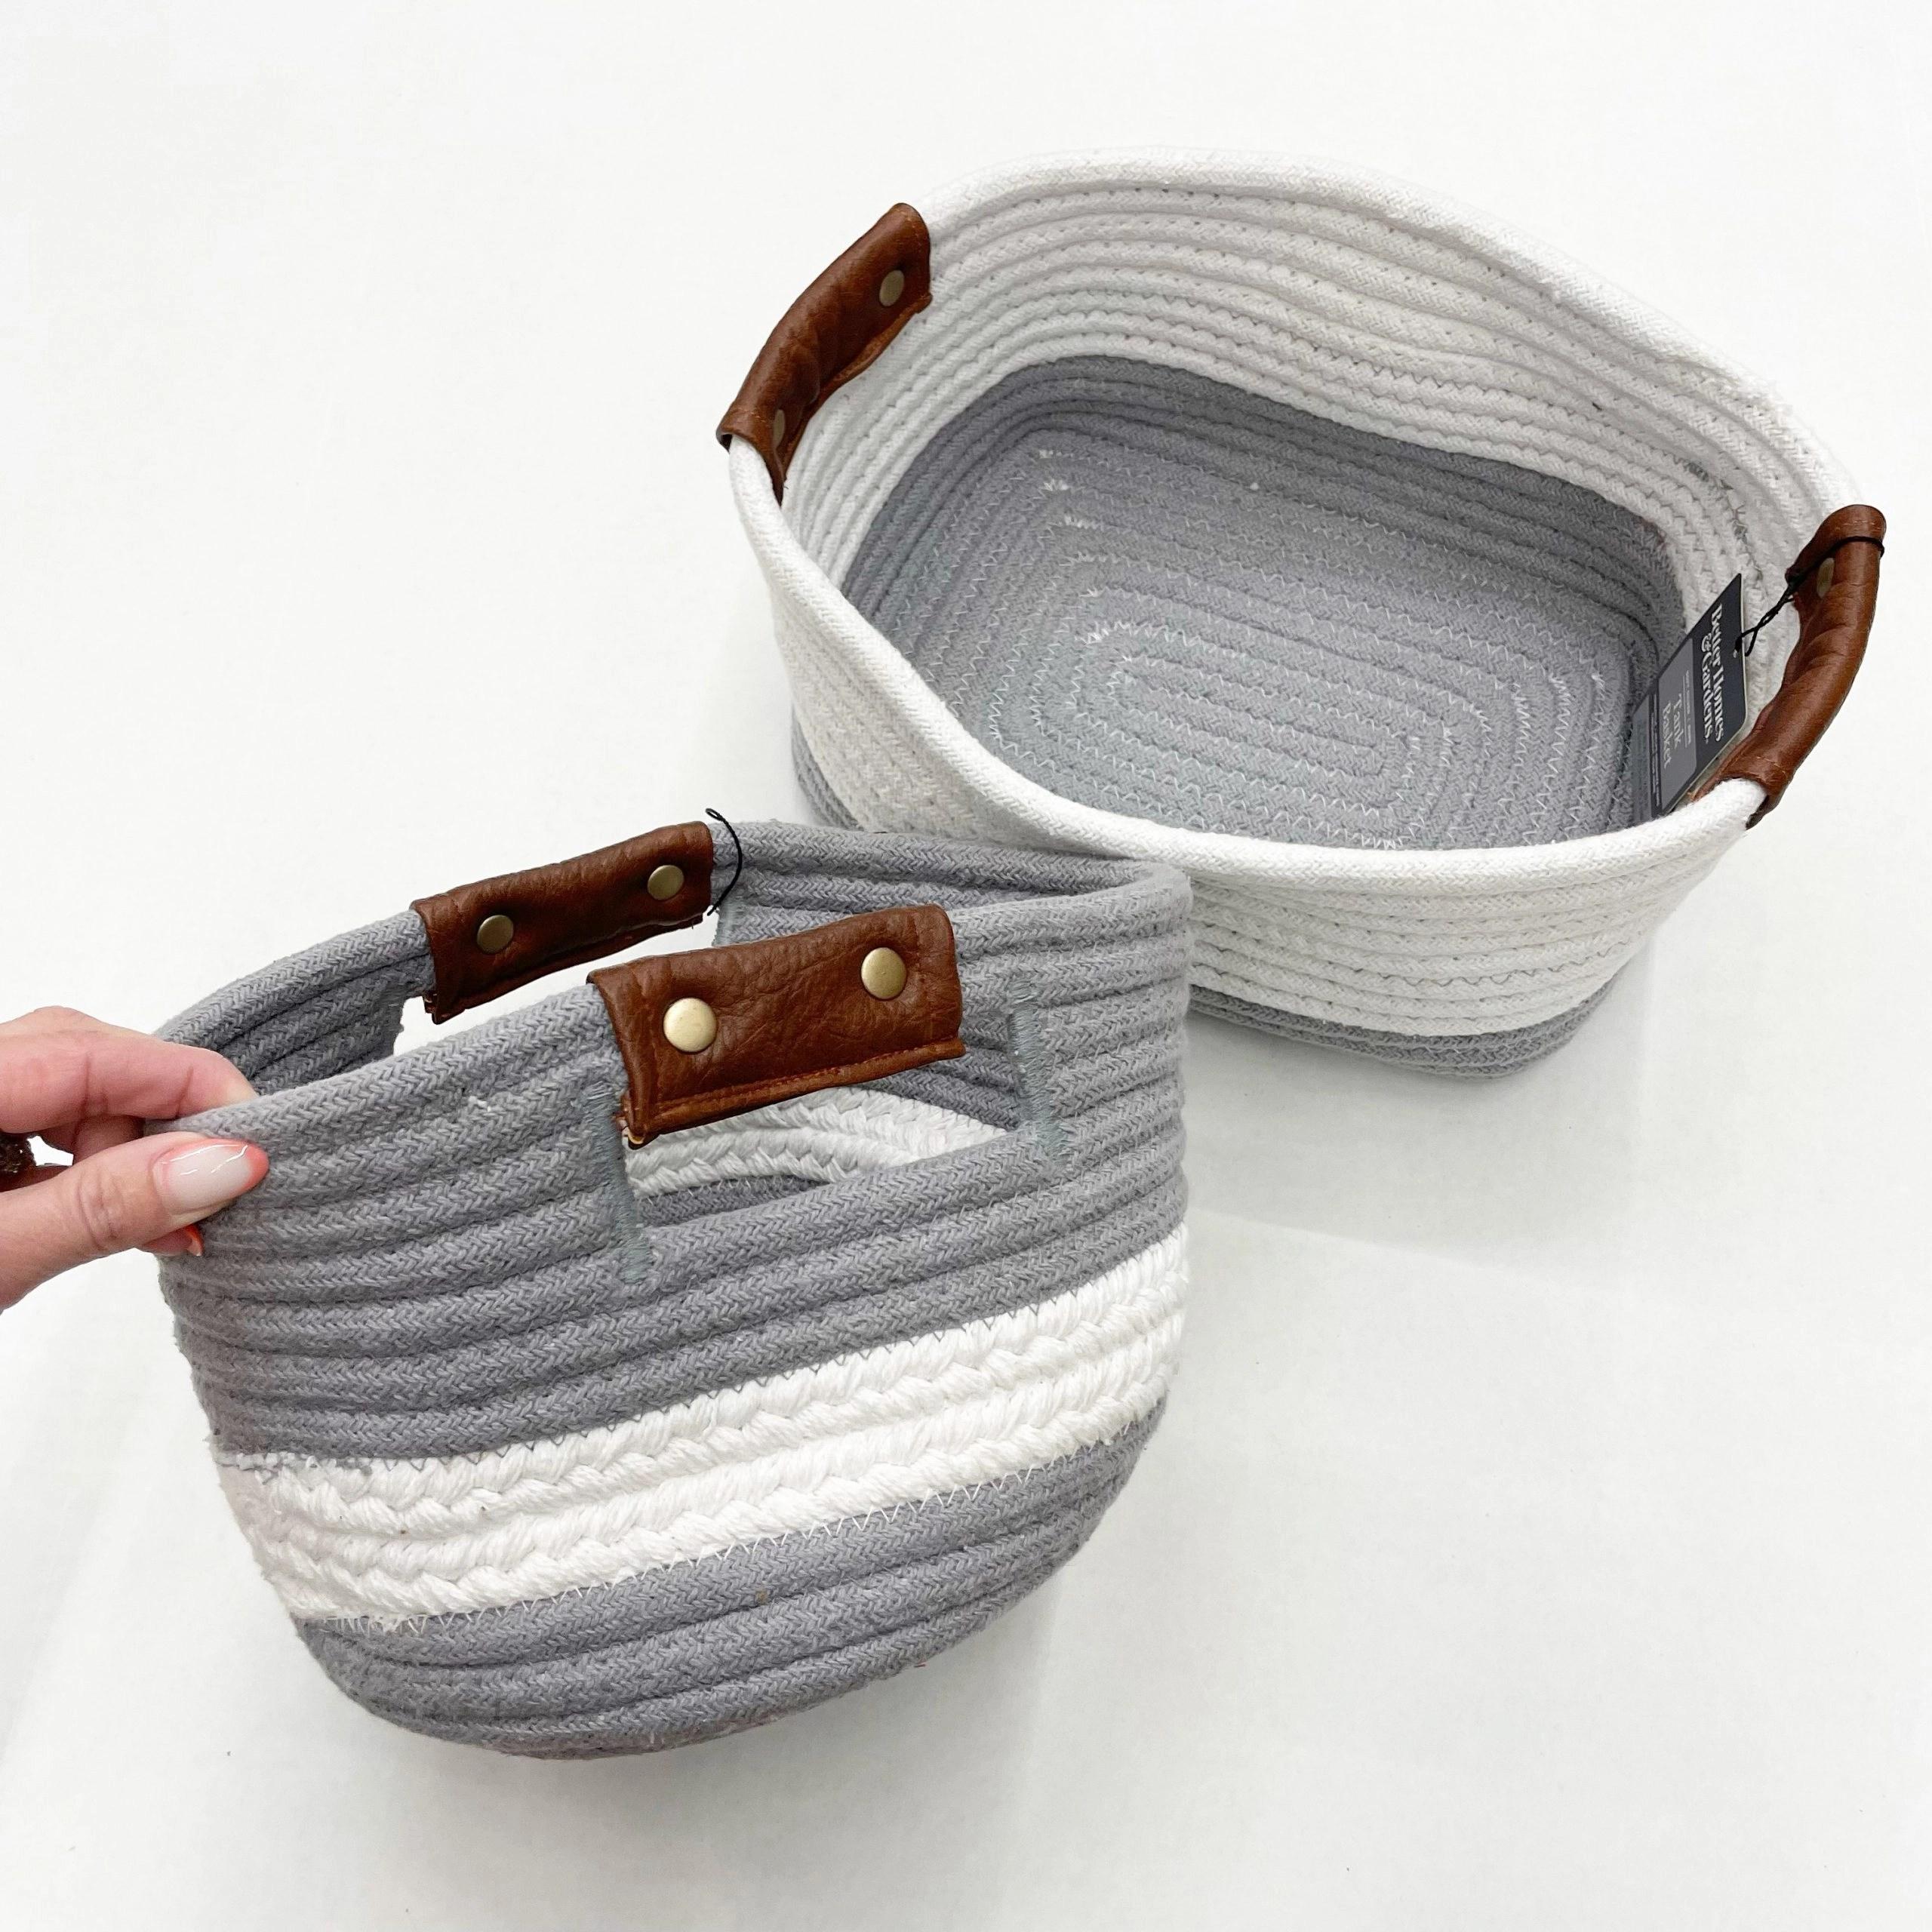 Better Homes & Gardens Cotton Rope Braided Storage Baskets